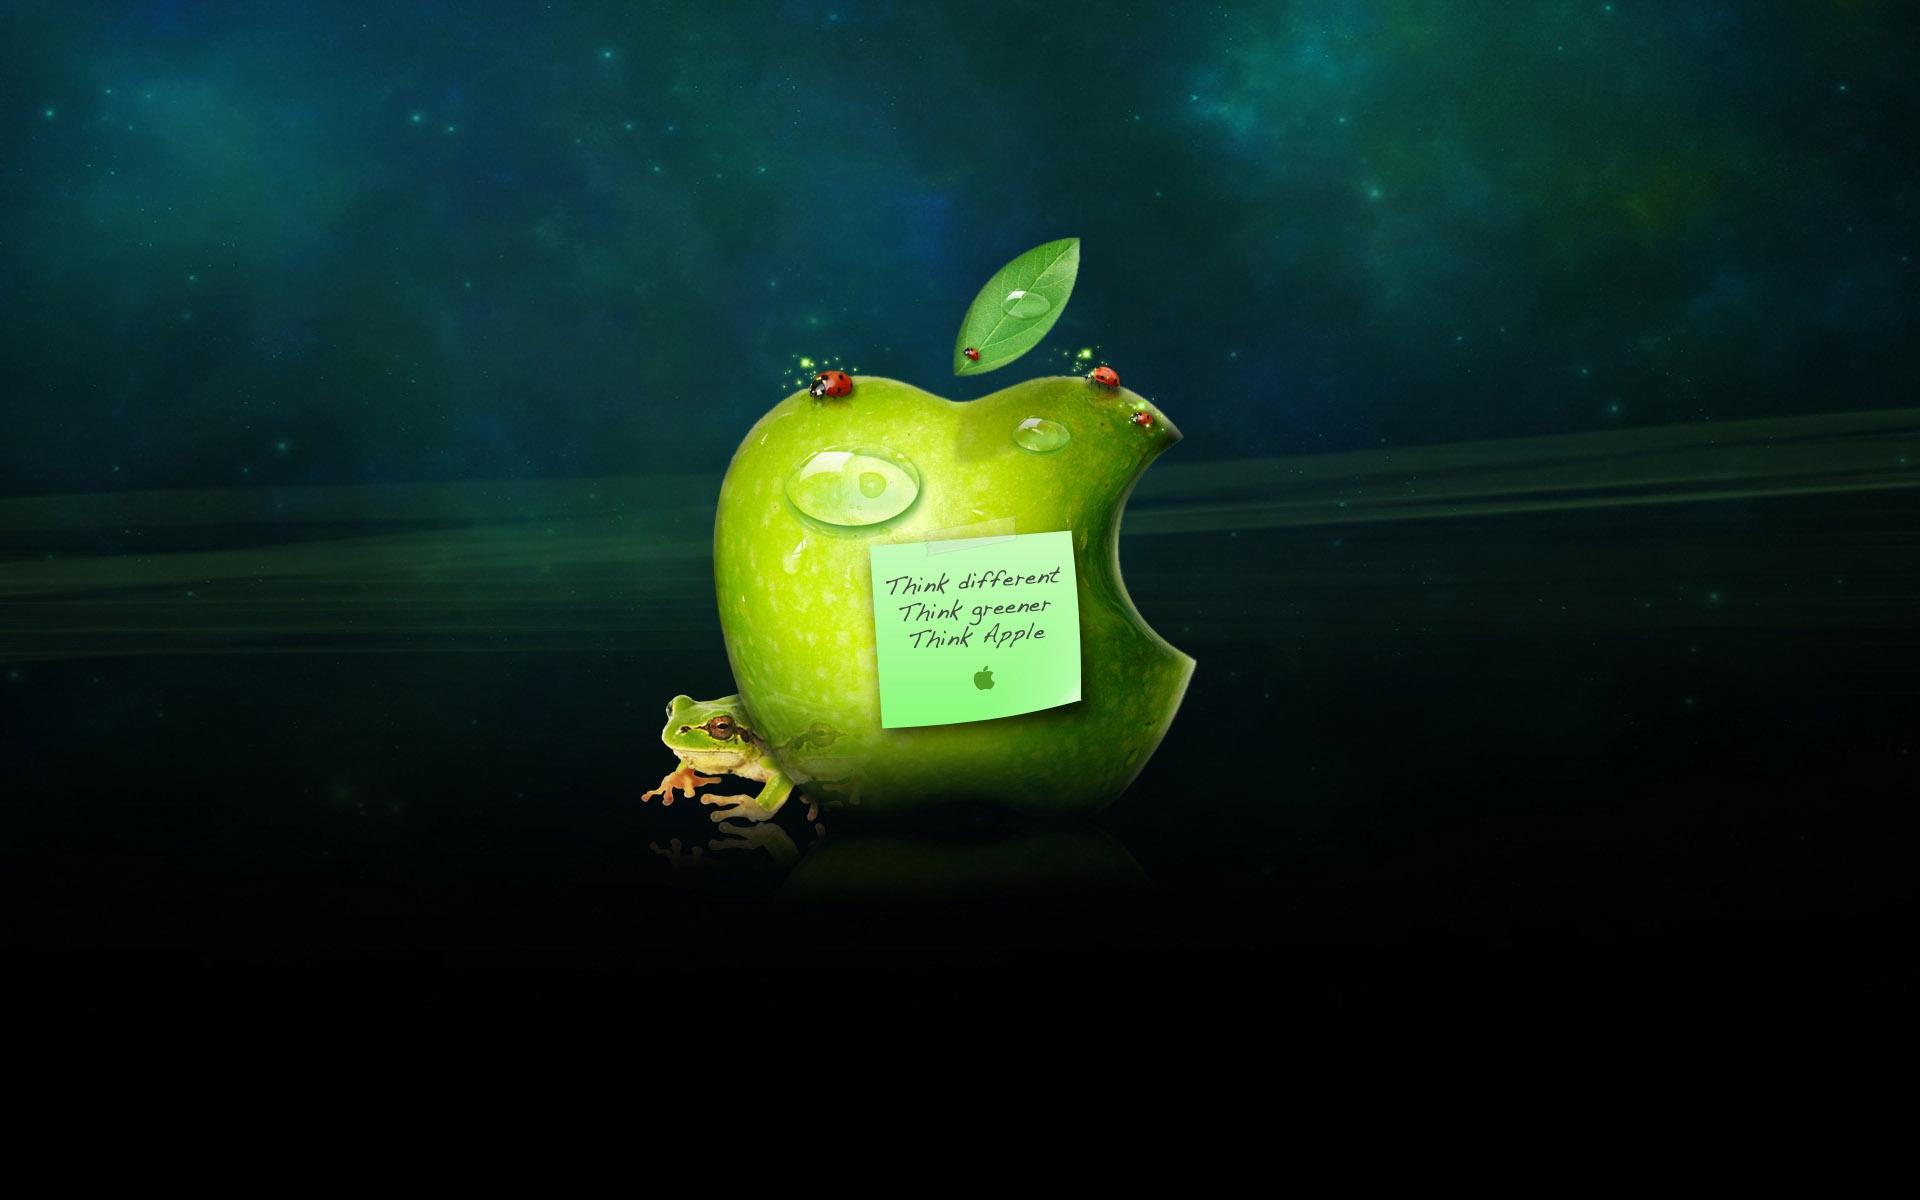 Apple Interesting Hd Wallpaper